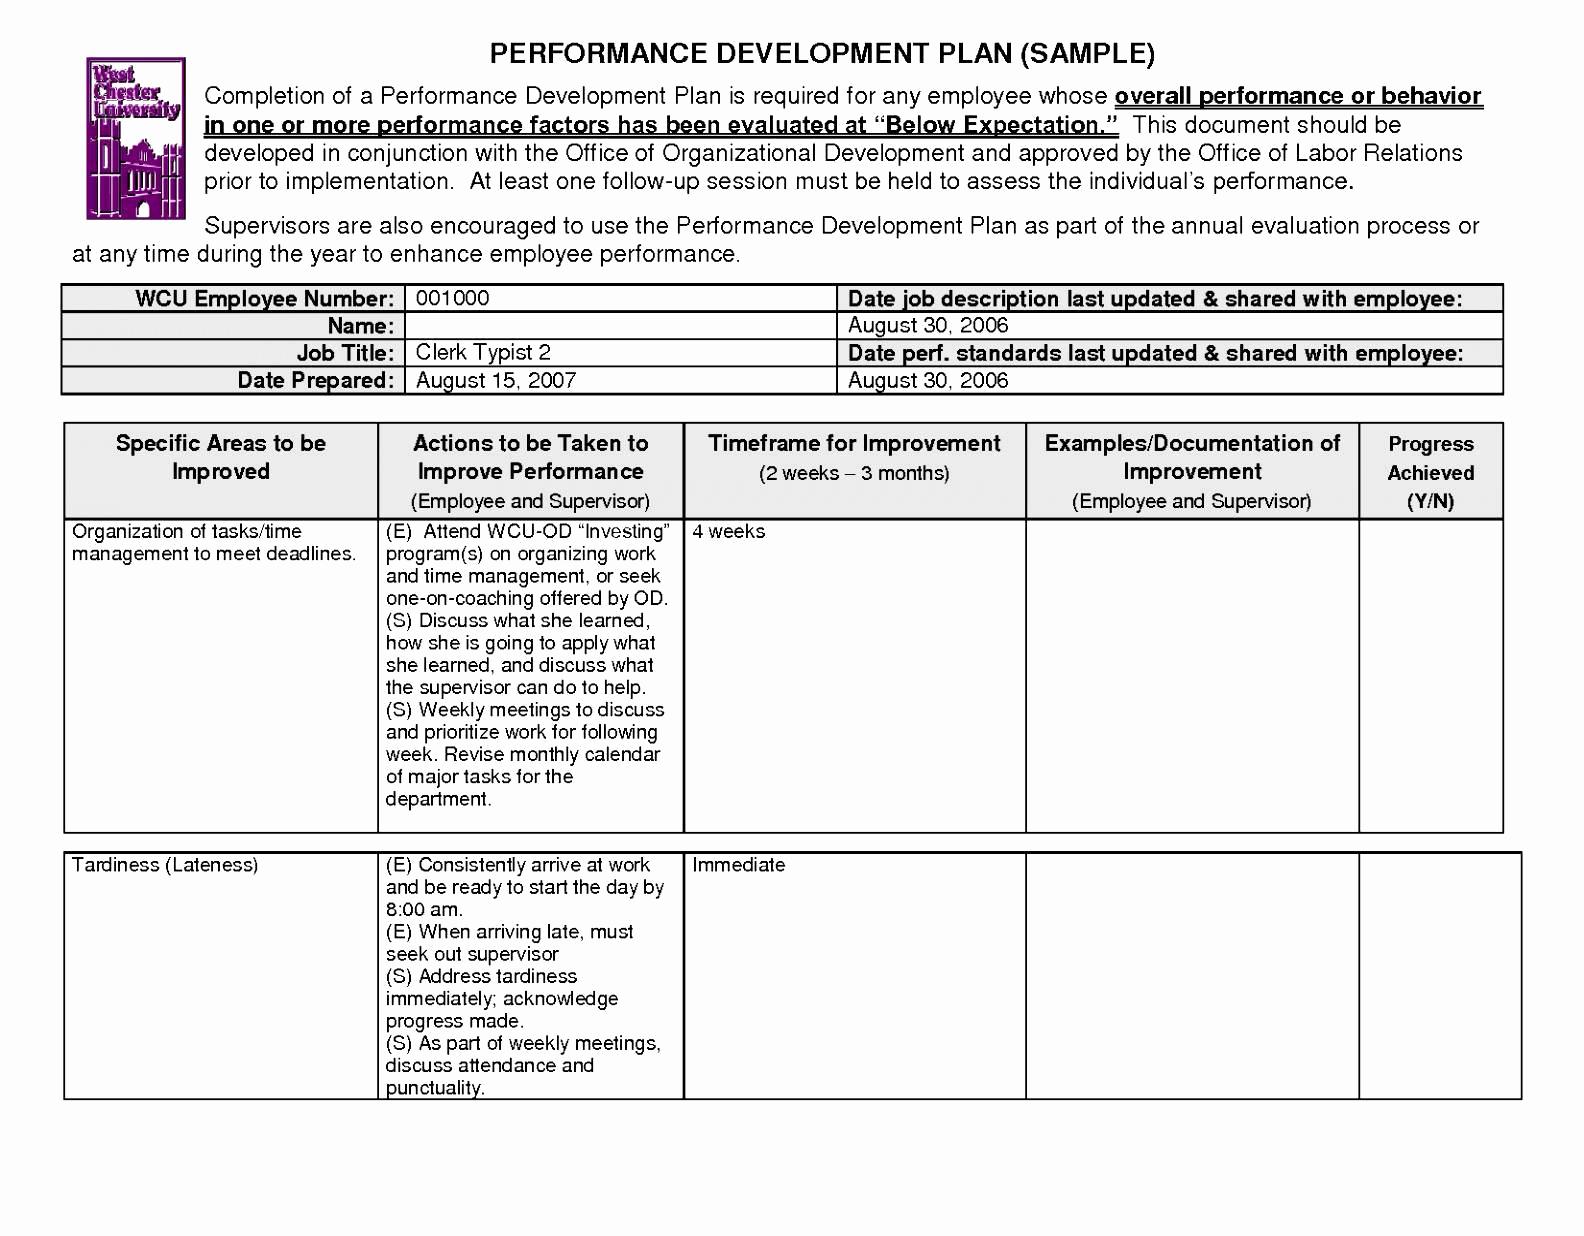 Meal Plan Spreadsheet Inside Fast Metabolism Diet Meal Plan Spreadsheet Rocket League Spreadsheet